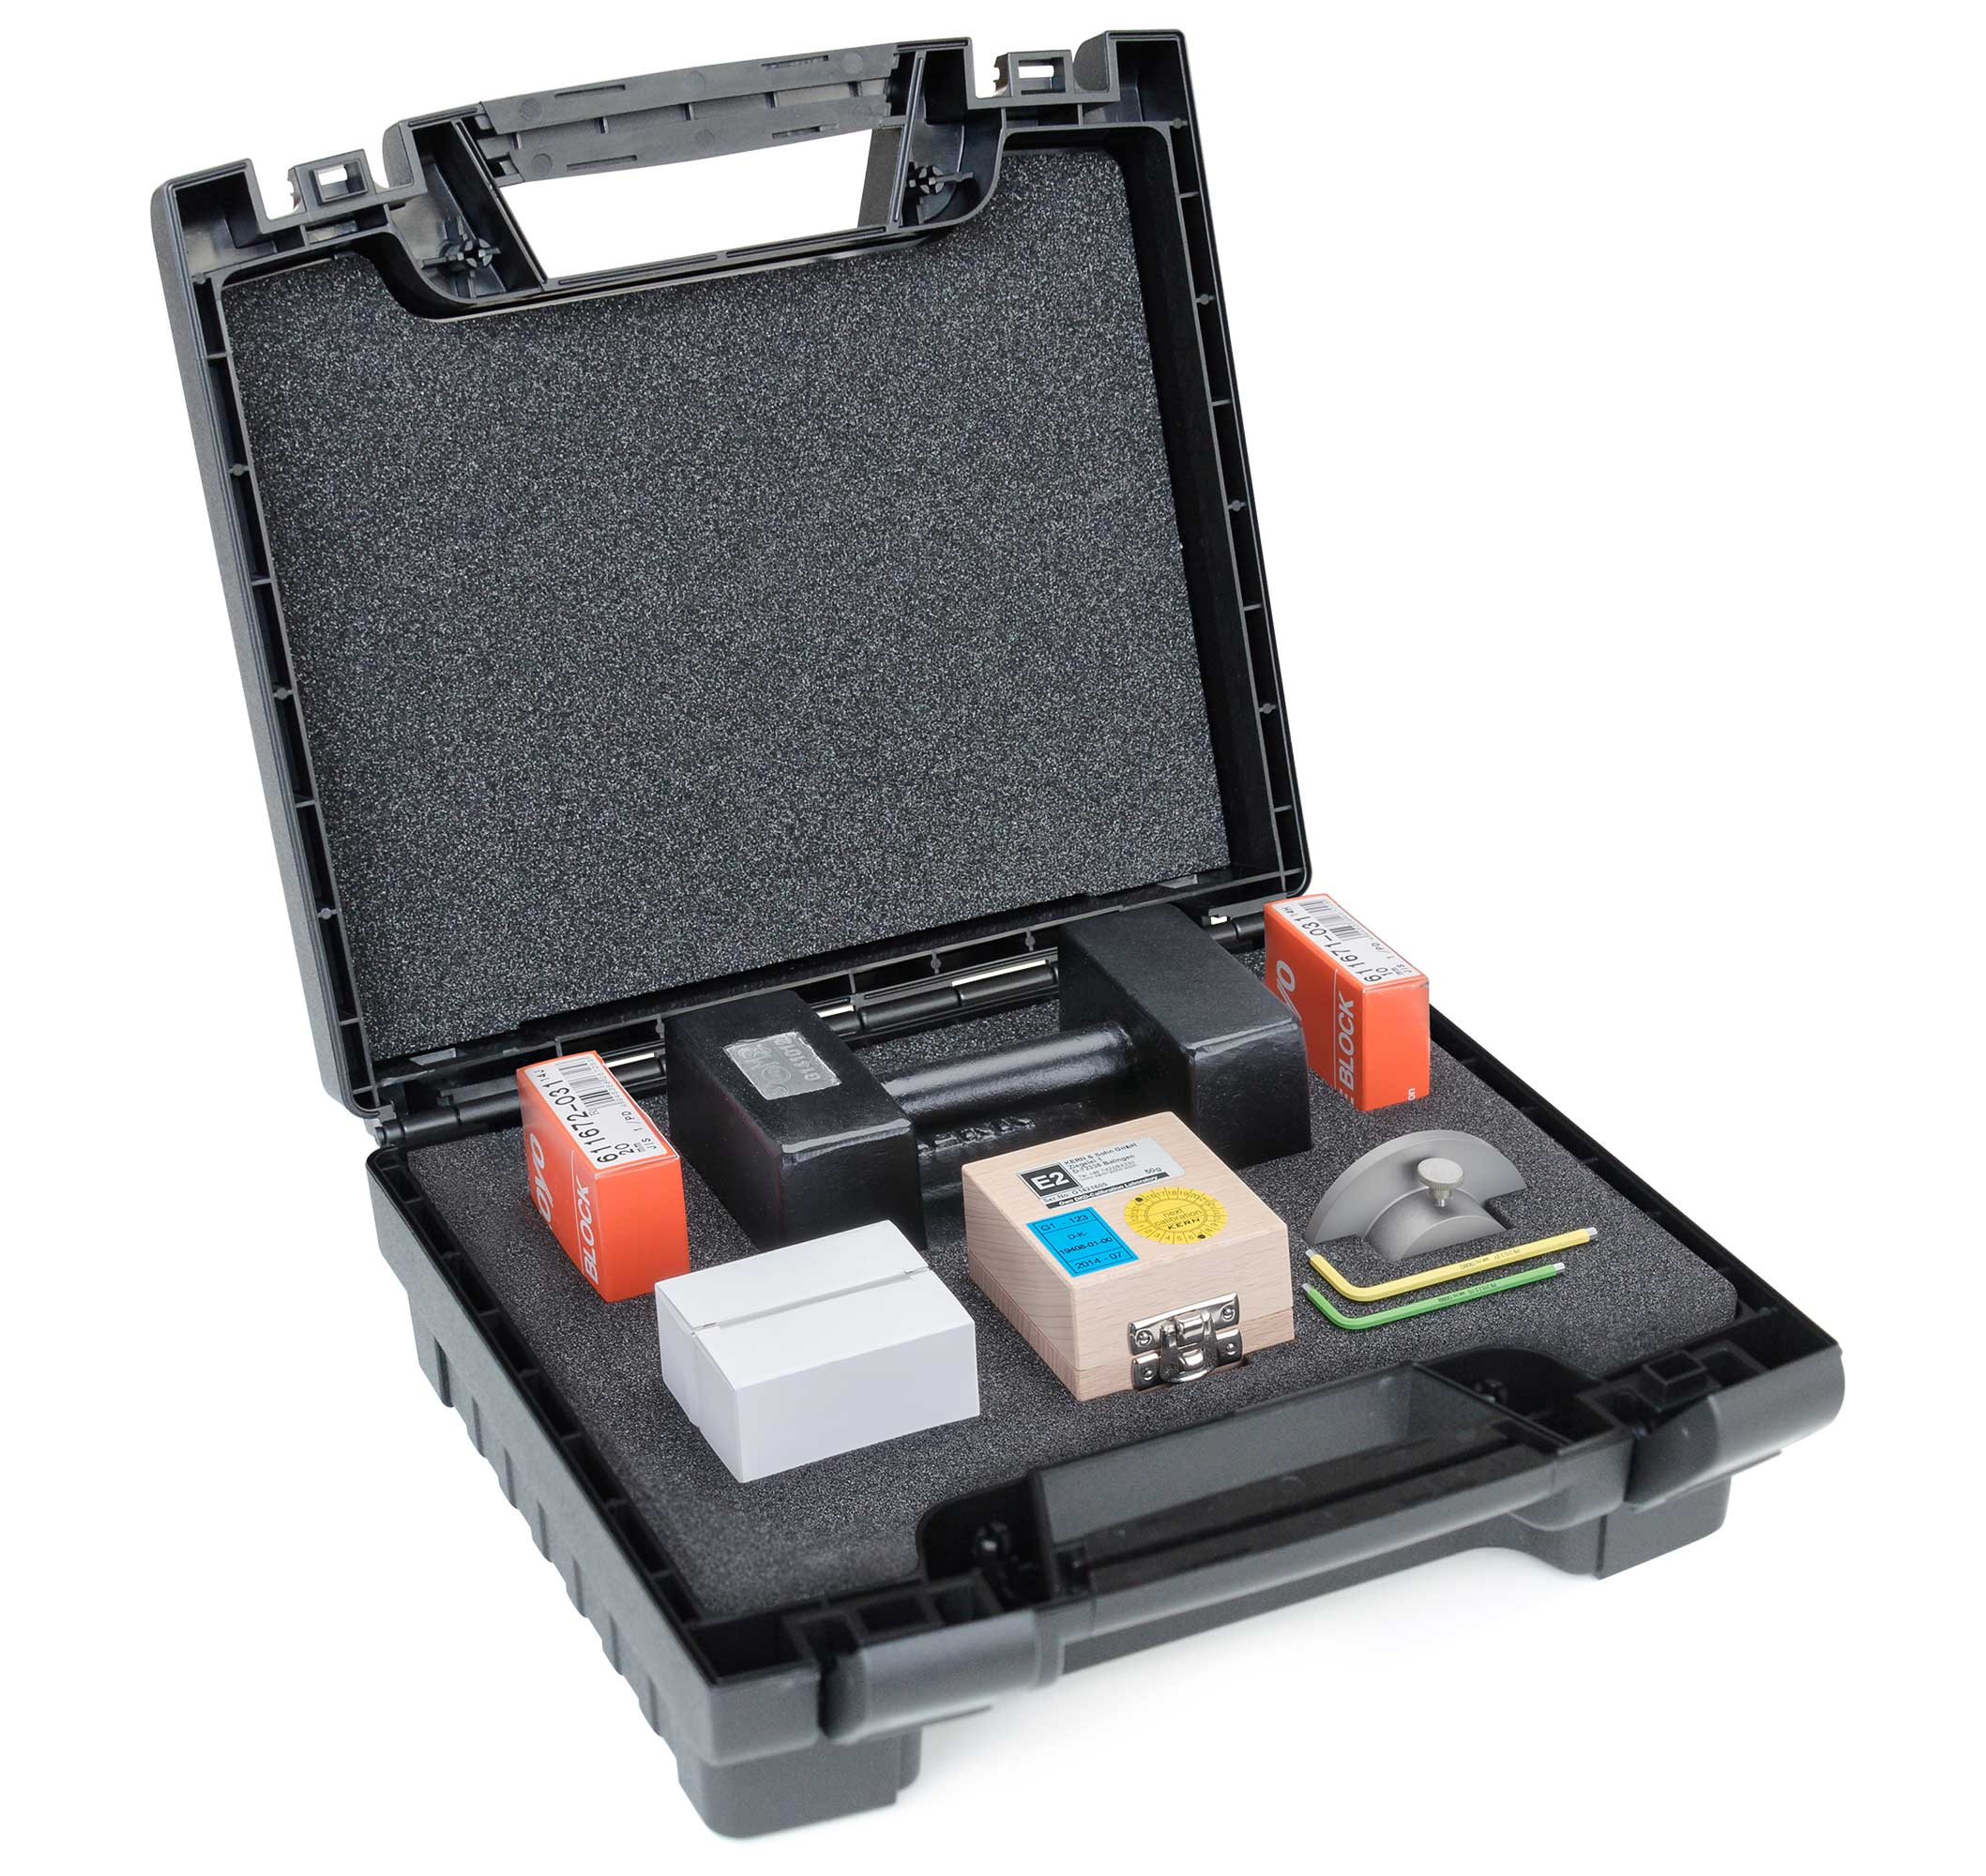 Kalibrierkoffer offen, Kraemer Elektronik GmbH, Tablettentestsysteme